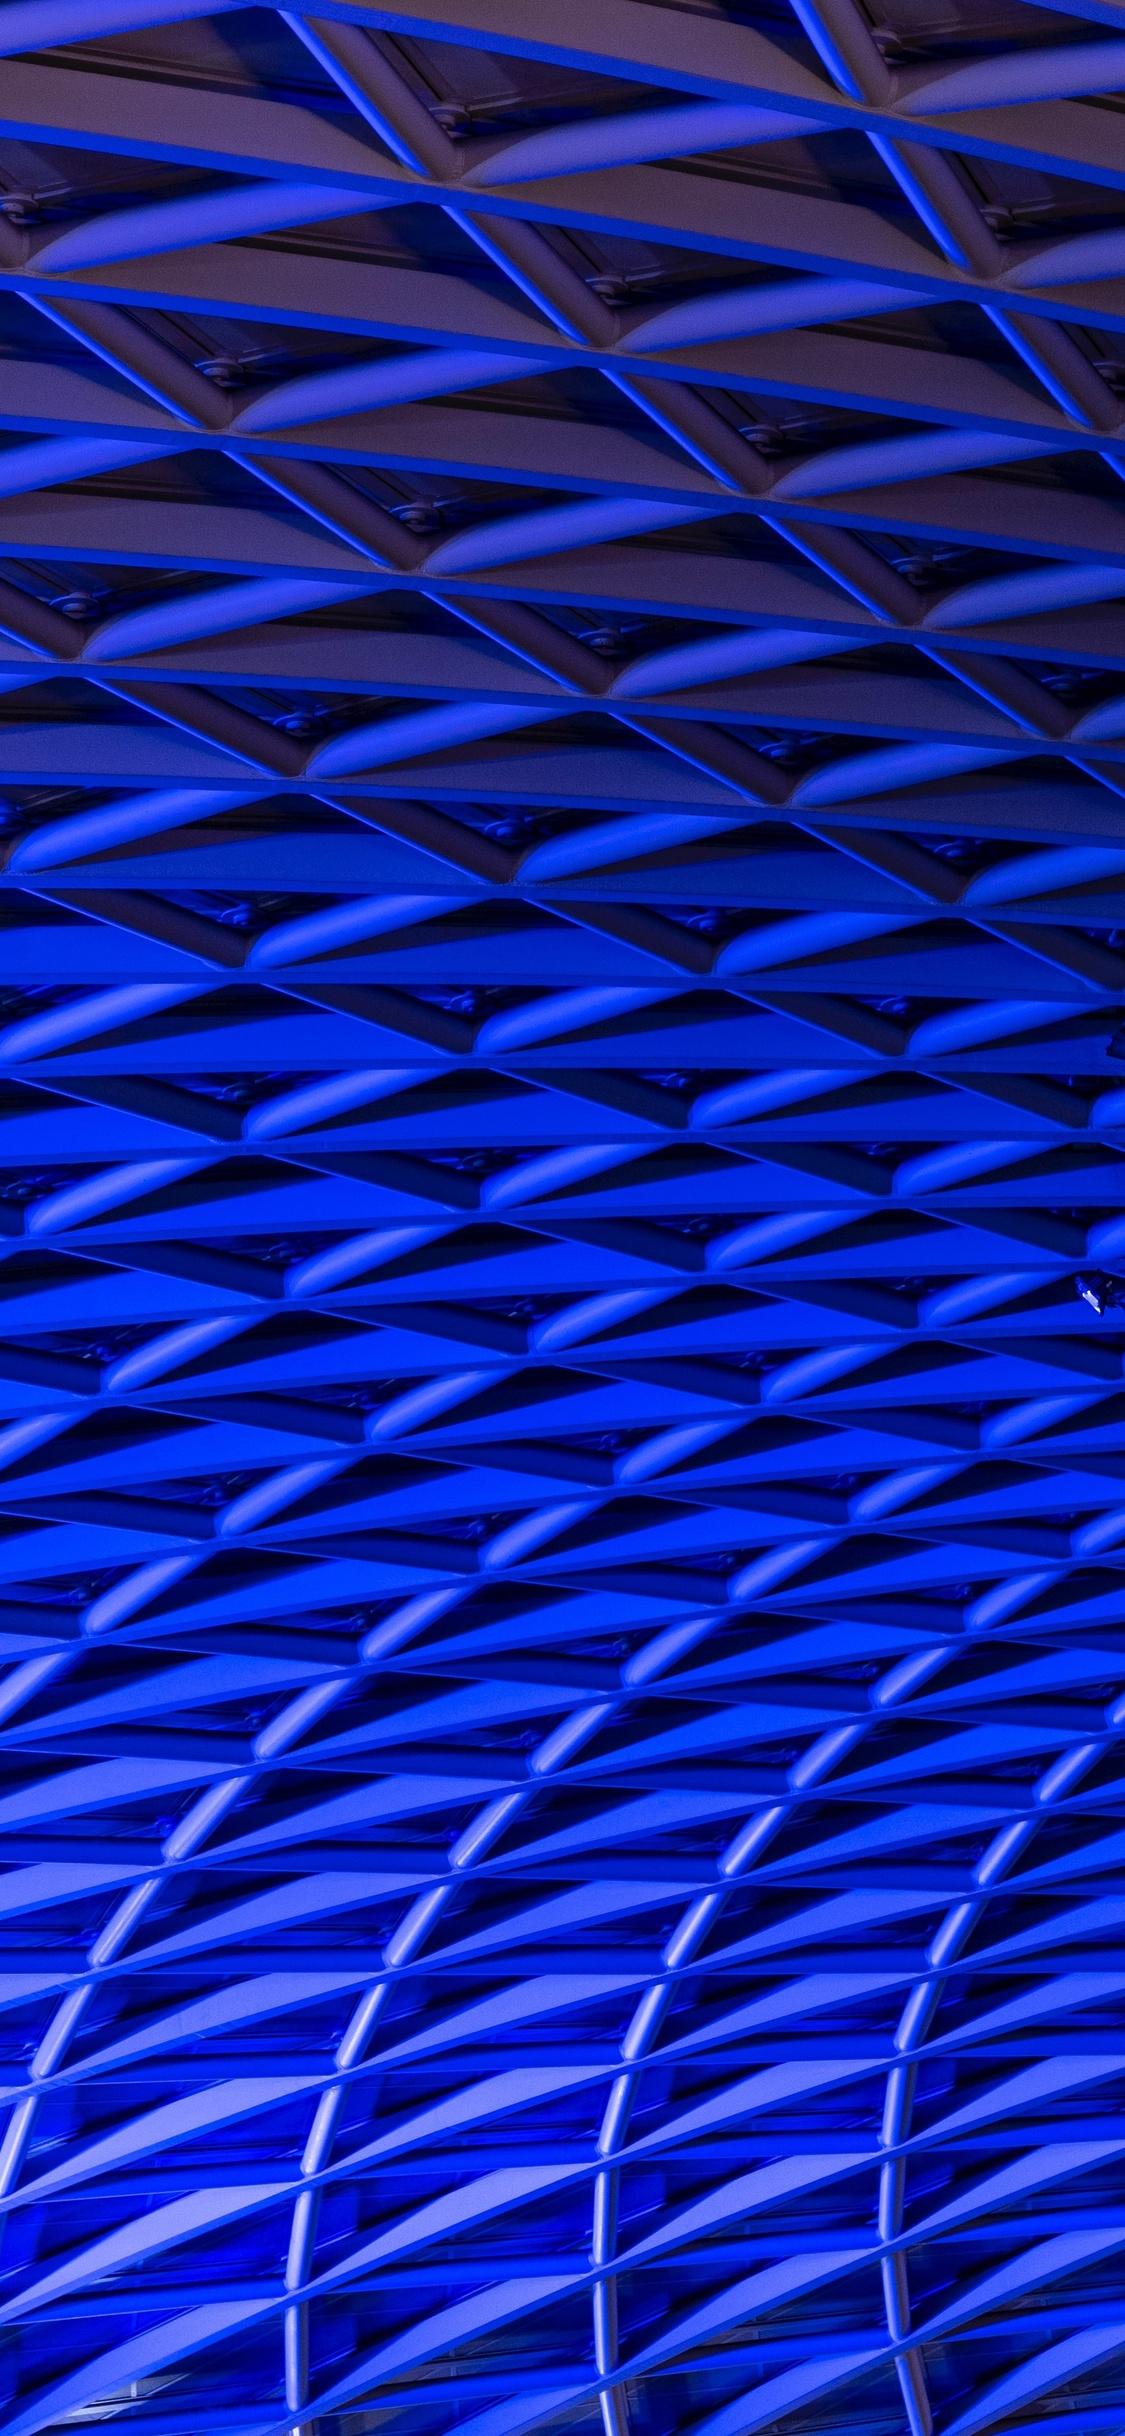 pattern-abstract-5k-bz.jpg